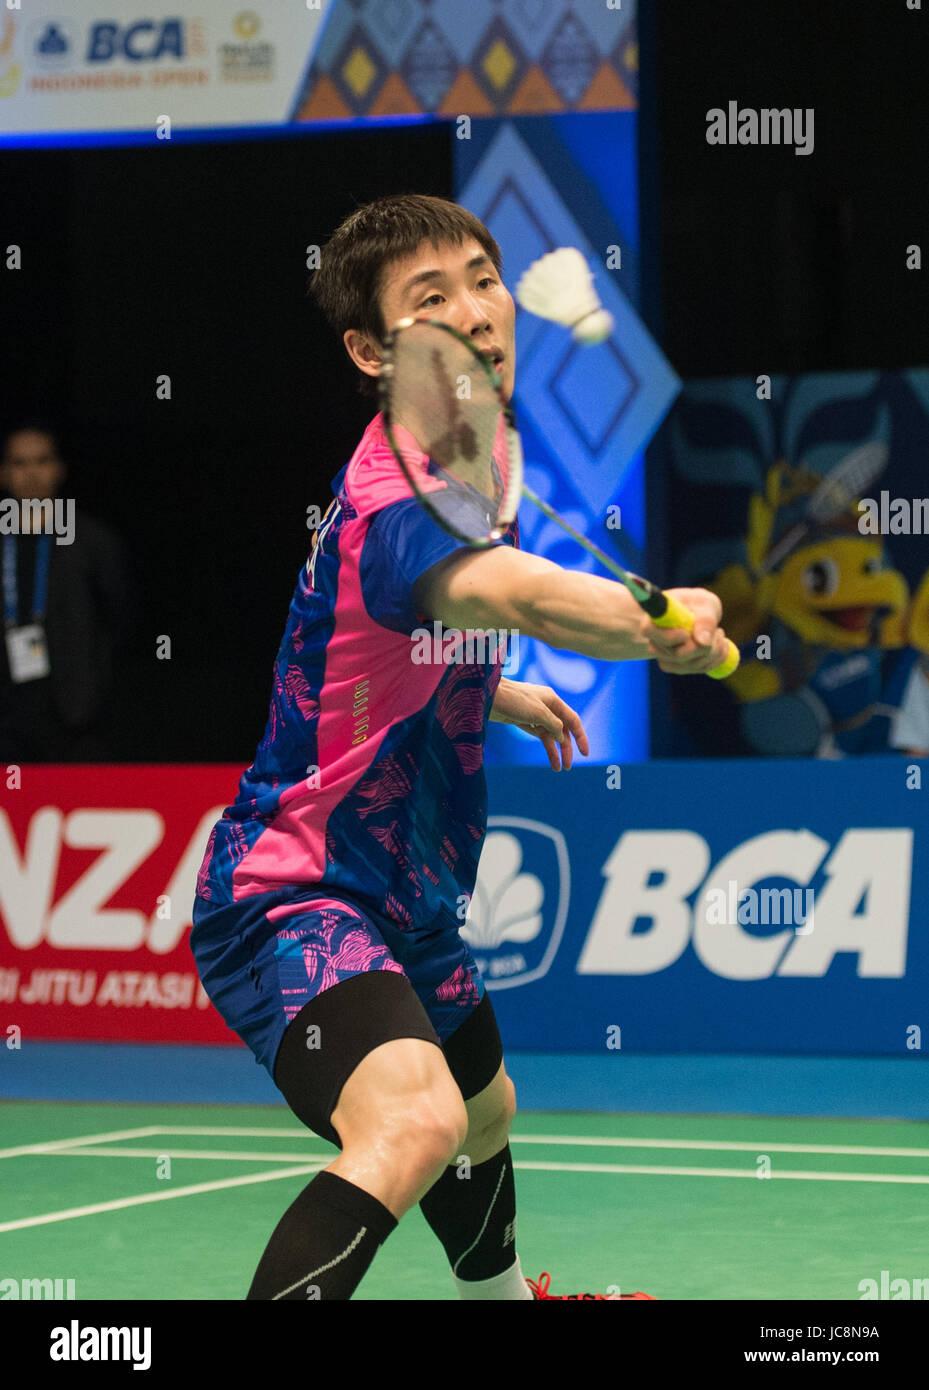 JAKARTA June 14 2017 Xinhua Son Wan Ho of South